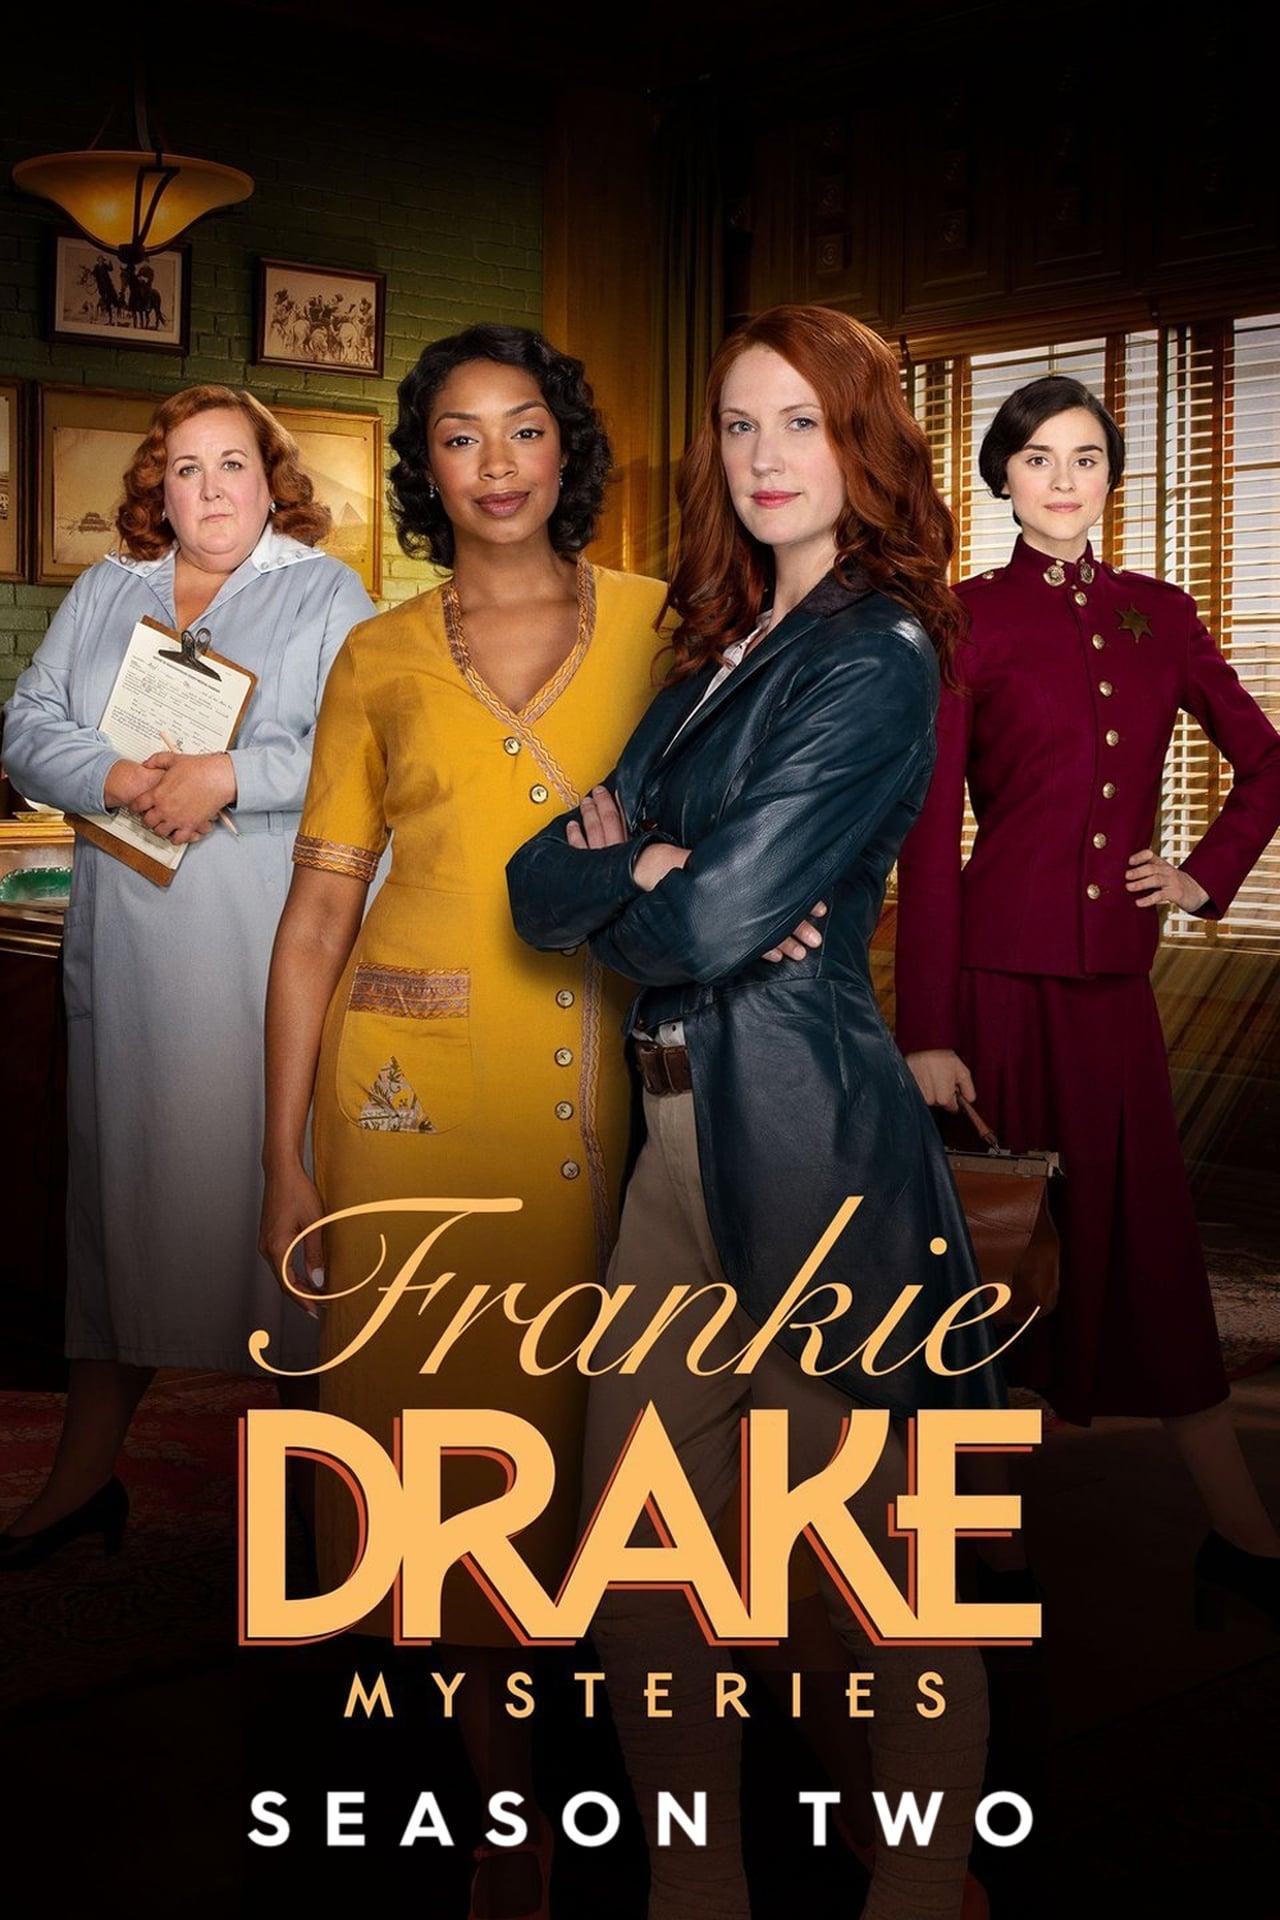 Putlocker Frankie Drake Mysteries Season 2 (2018)